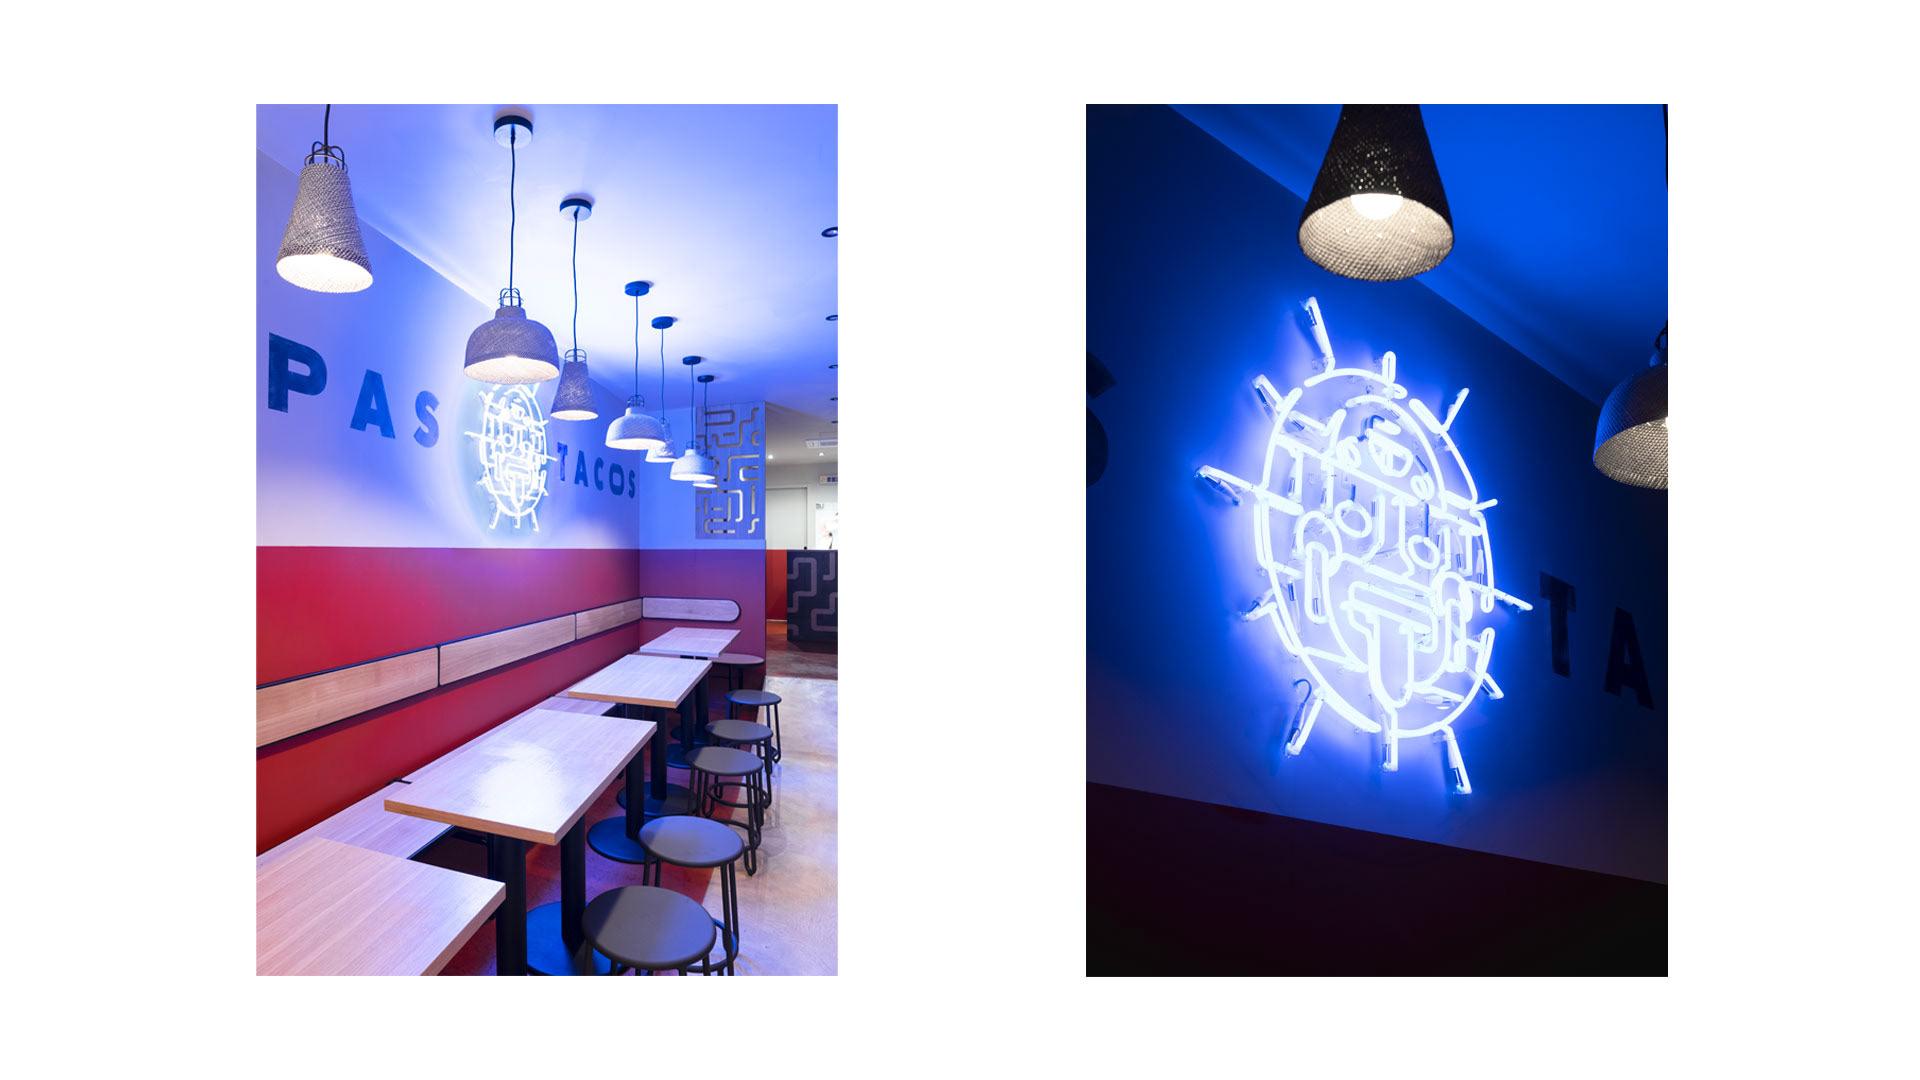 Tailor made neon sign for Papas Tacos Bordeaux restaurant